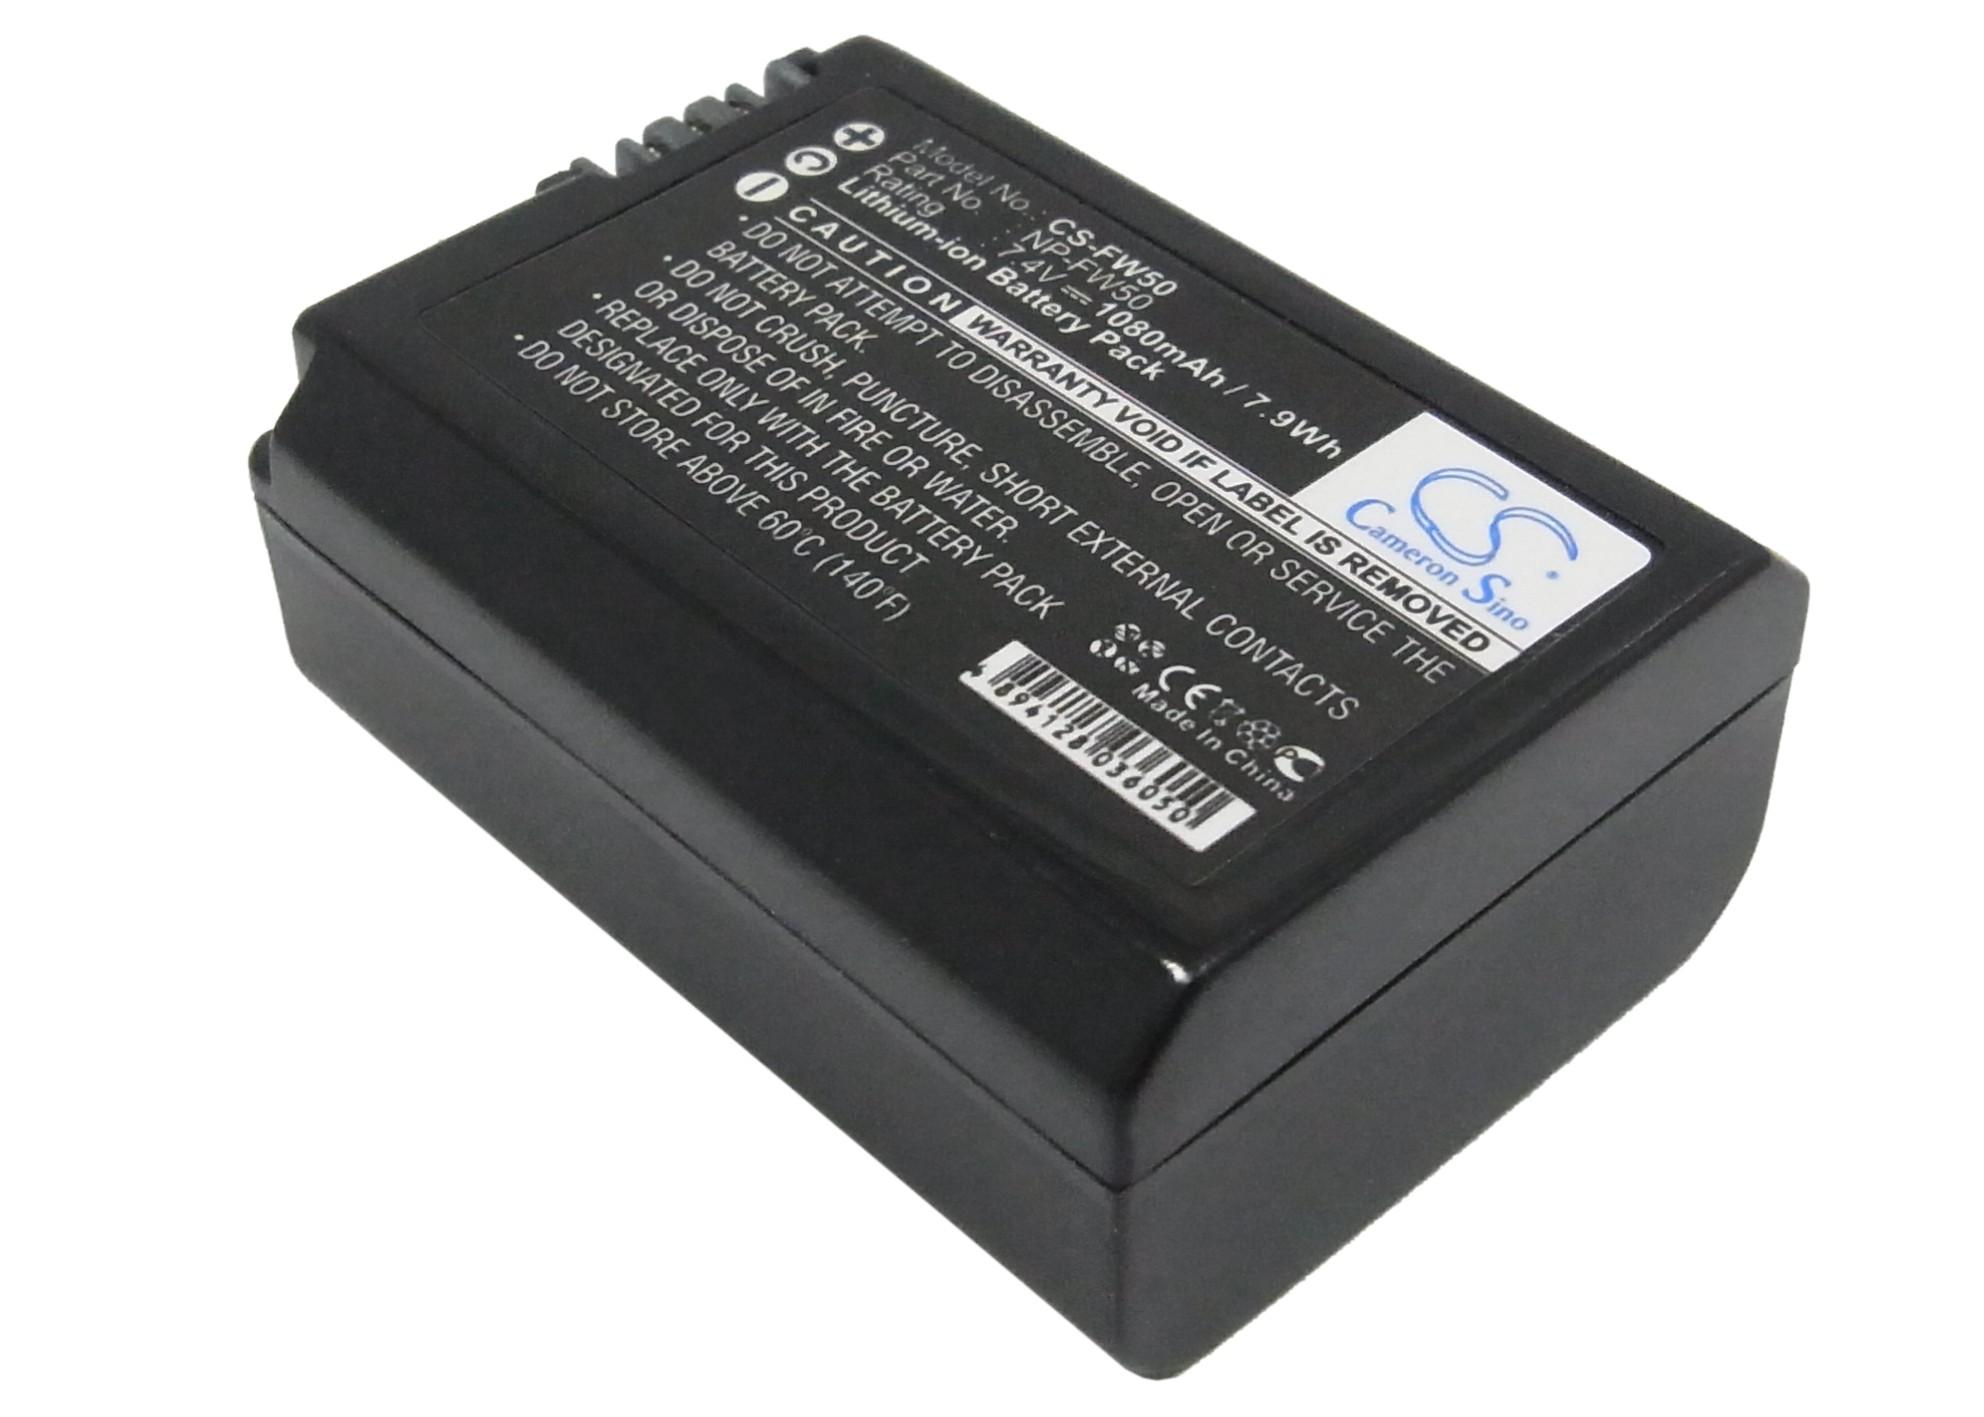 Cameron Sino baterie do kamer a fotoaparátů pro SONY Mirrorless Alpha A6000 7.4V Li-ion 1080mAh černá - neoriginální